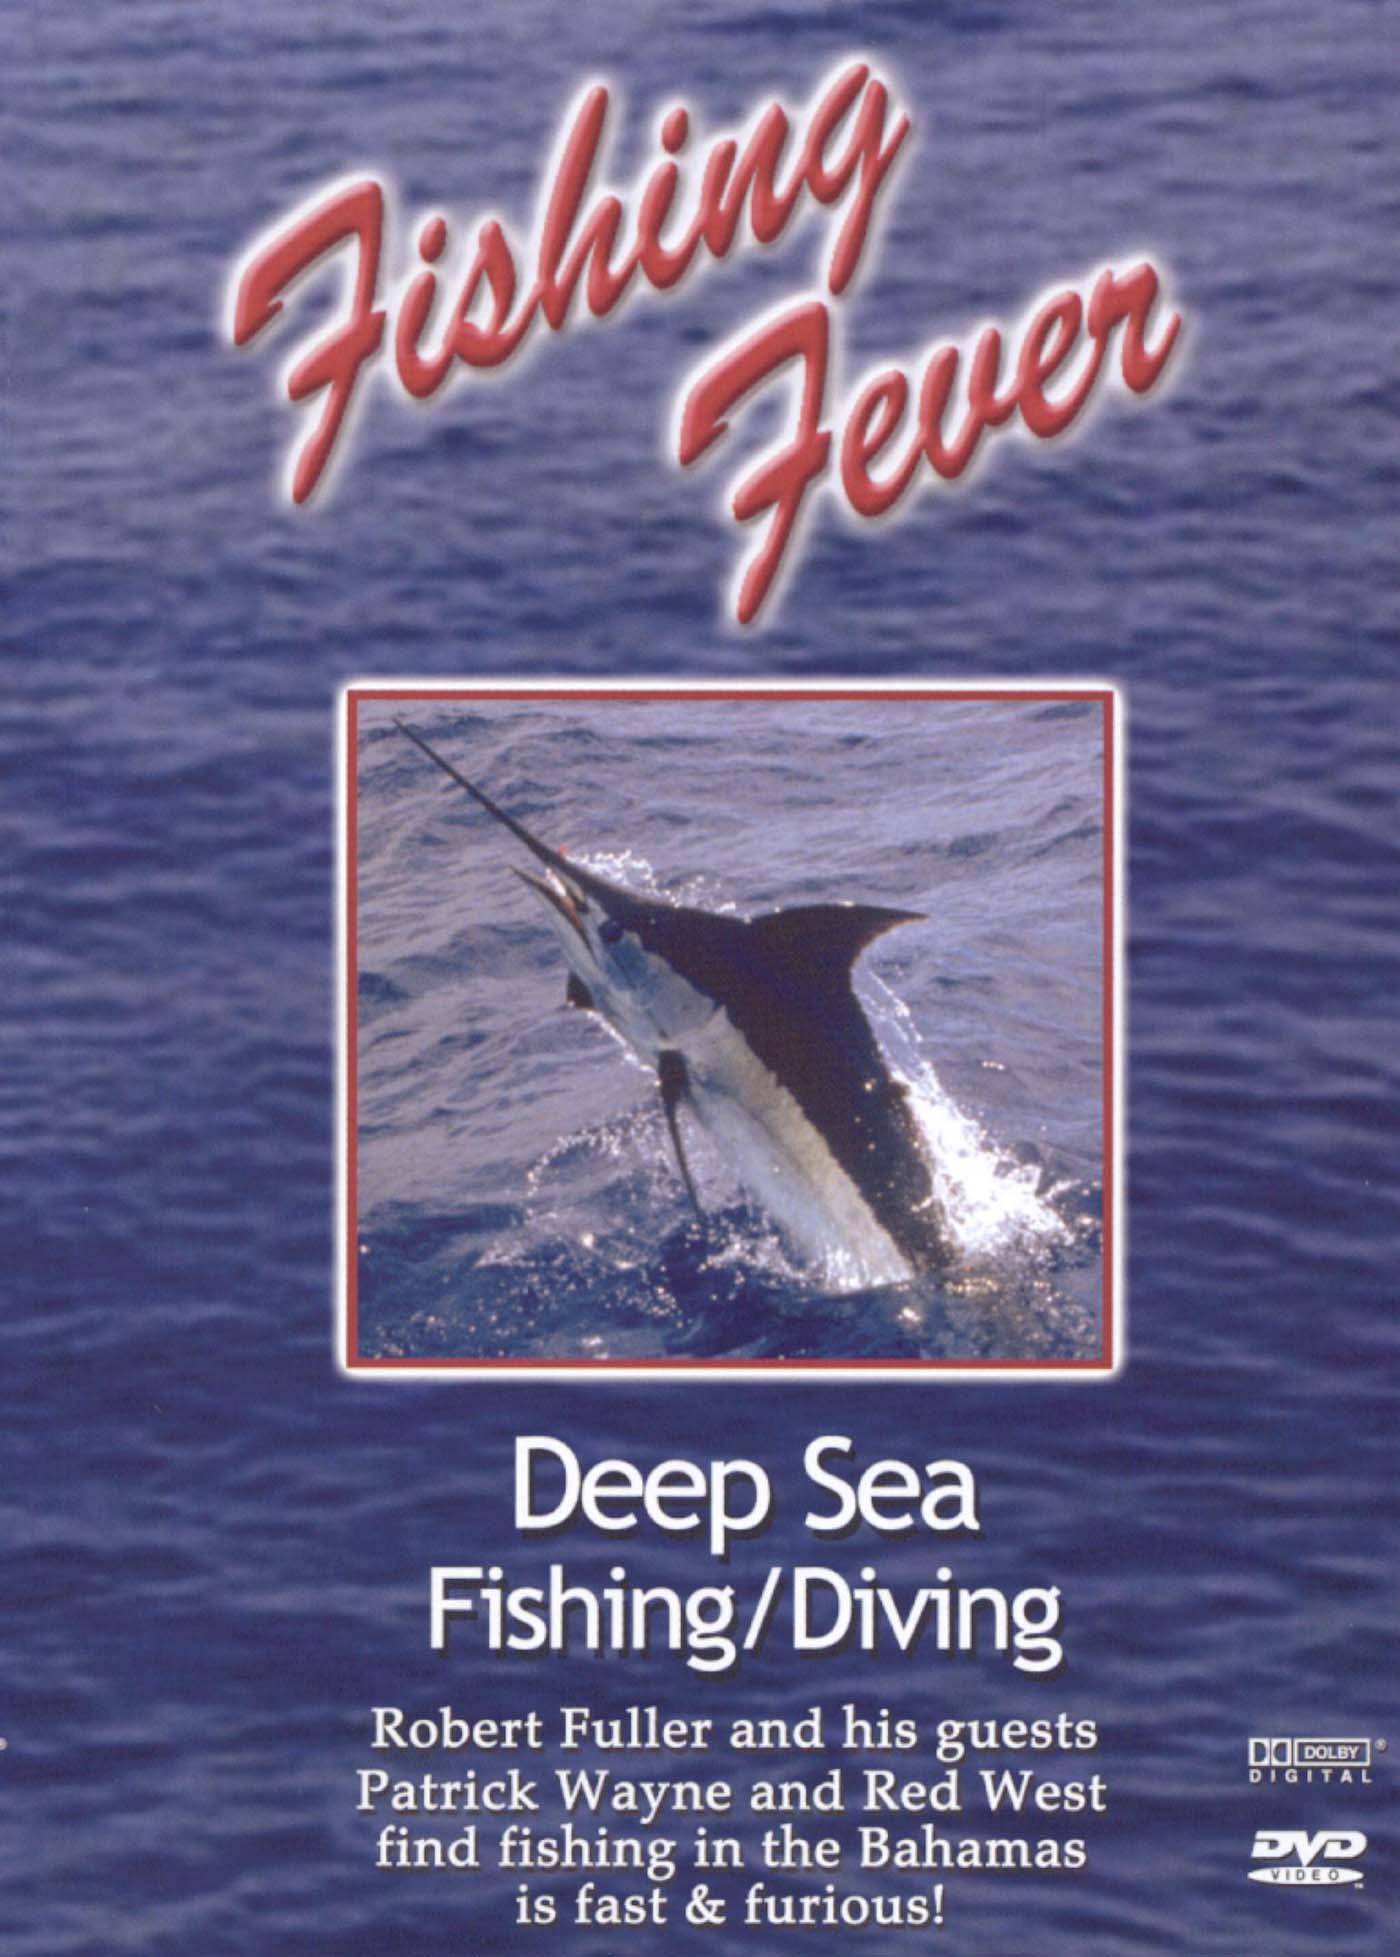 Fishing Fever: Deep Sea Fishing and Diving, Vol. 3